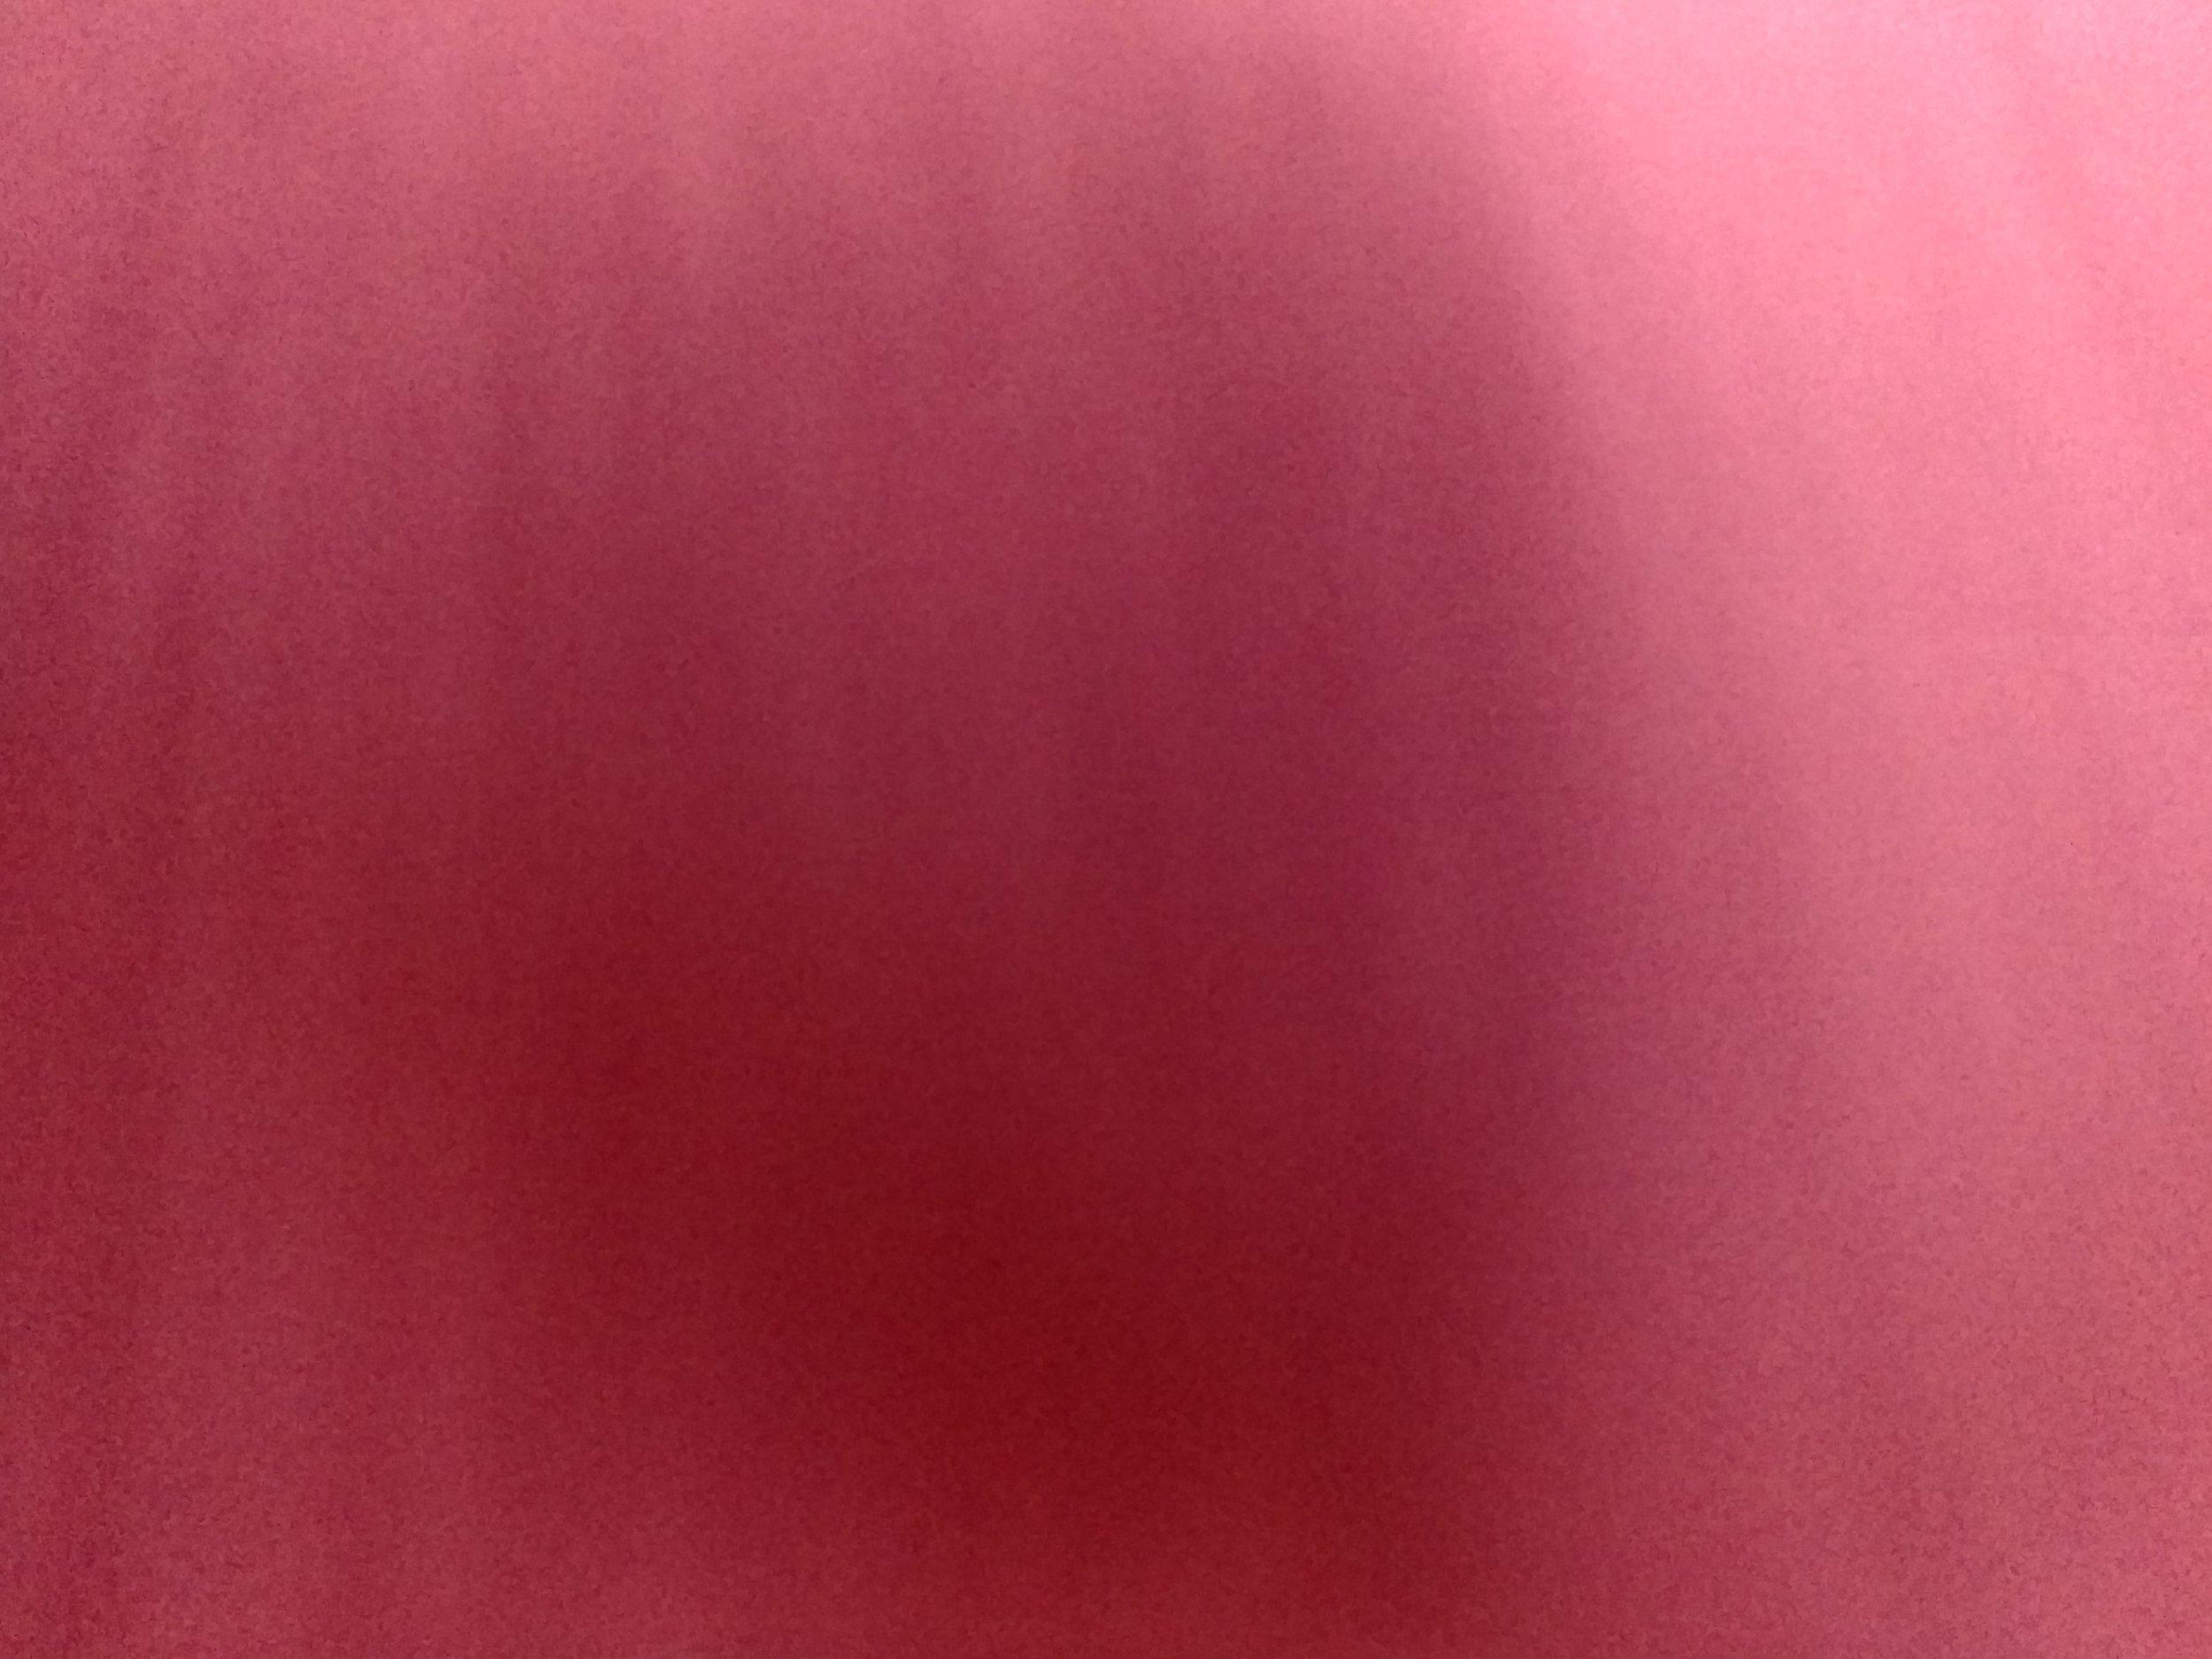 willroth-co-free-texture-gradient-093.jpg